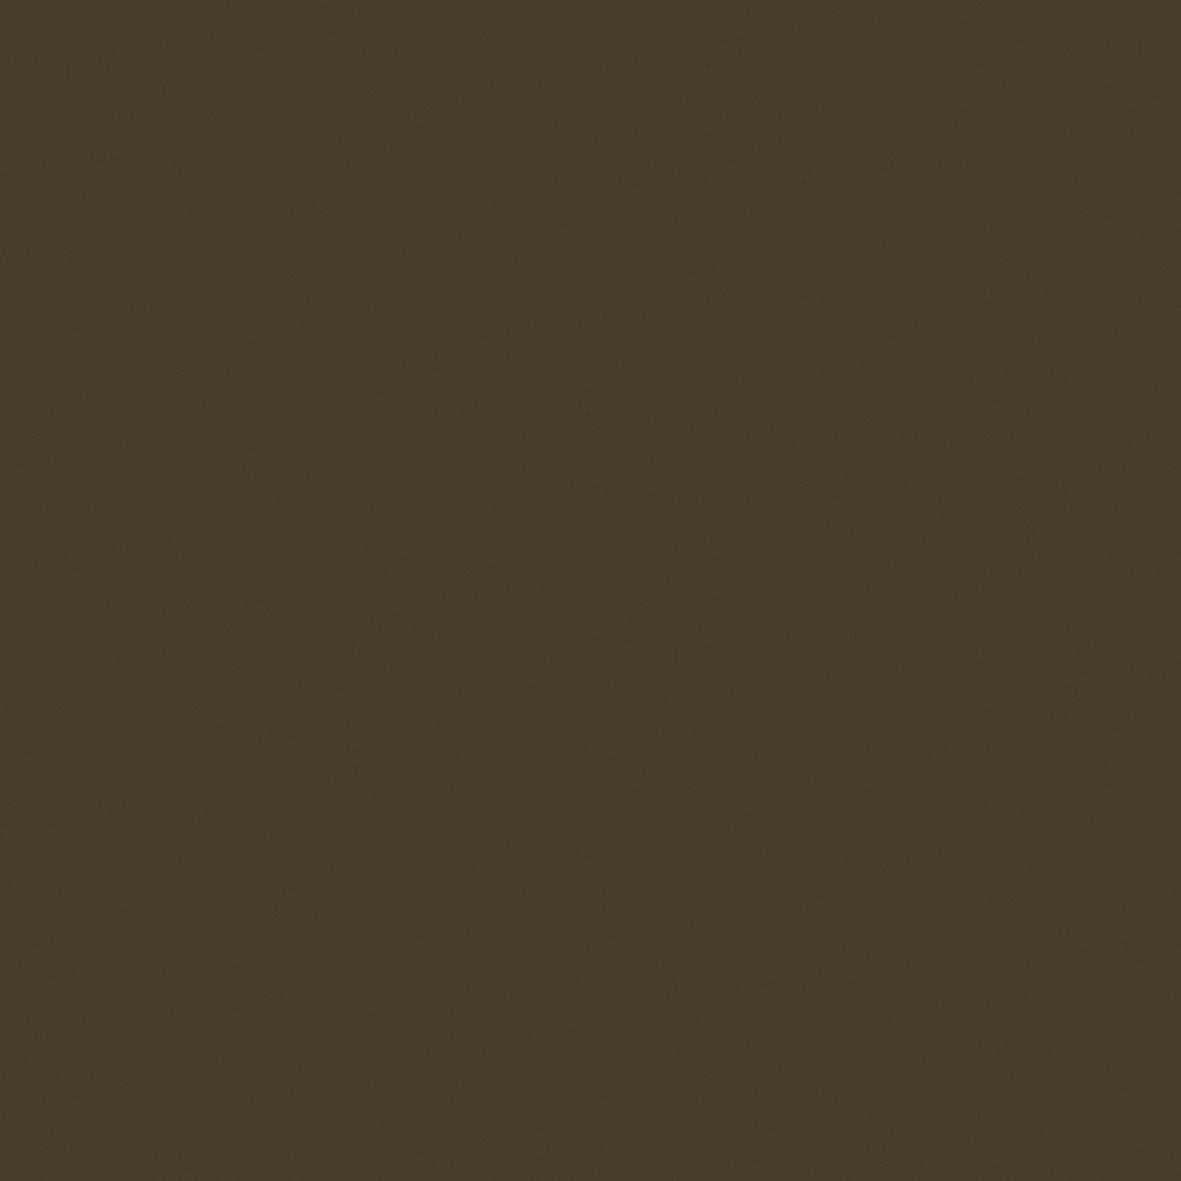 Kaisercraft Weave Texture Cardstock 12X12-Cinnamon